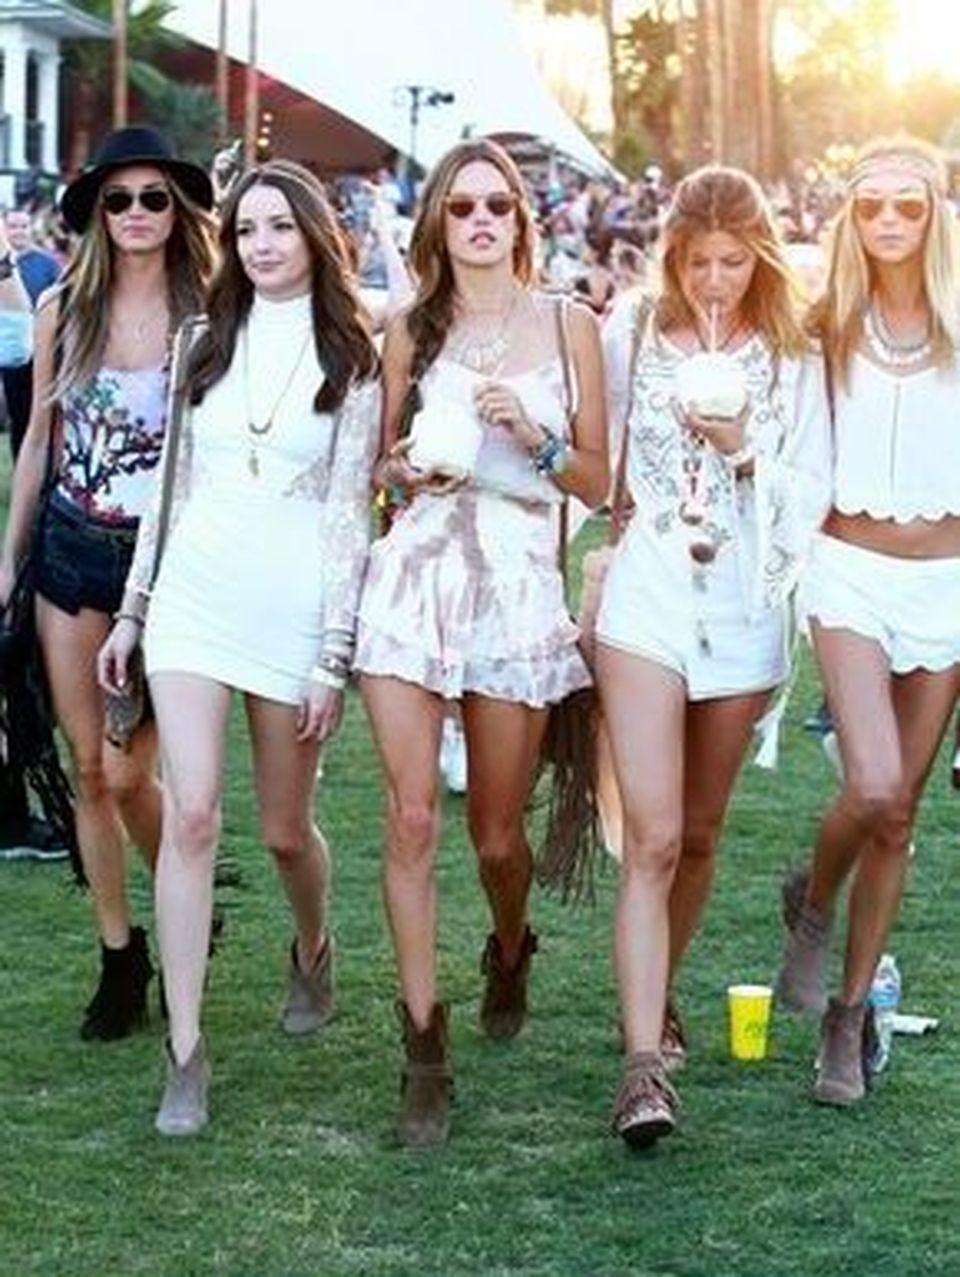 a118f871c3f2 Best Boho Dress Ideas for Coachella Outfits 2018